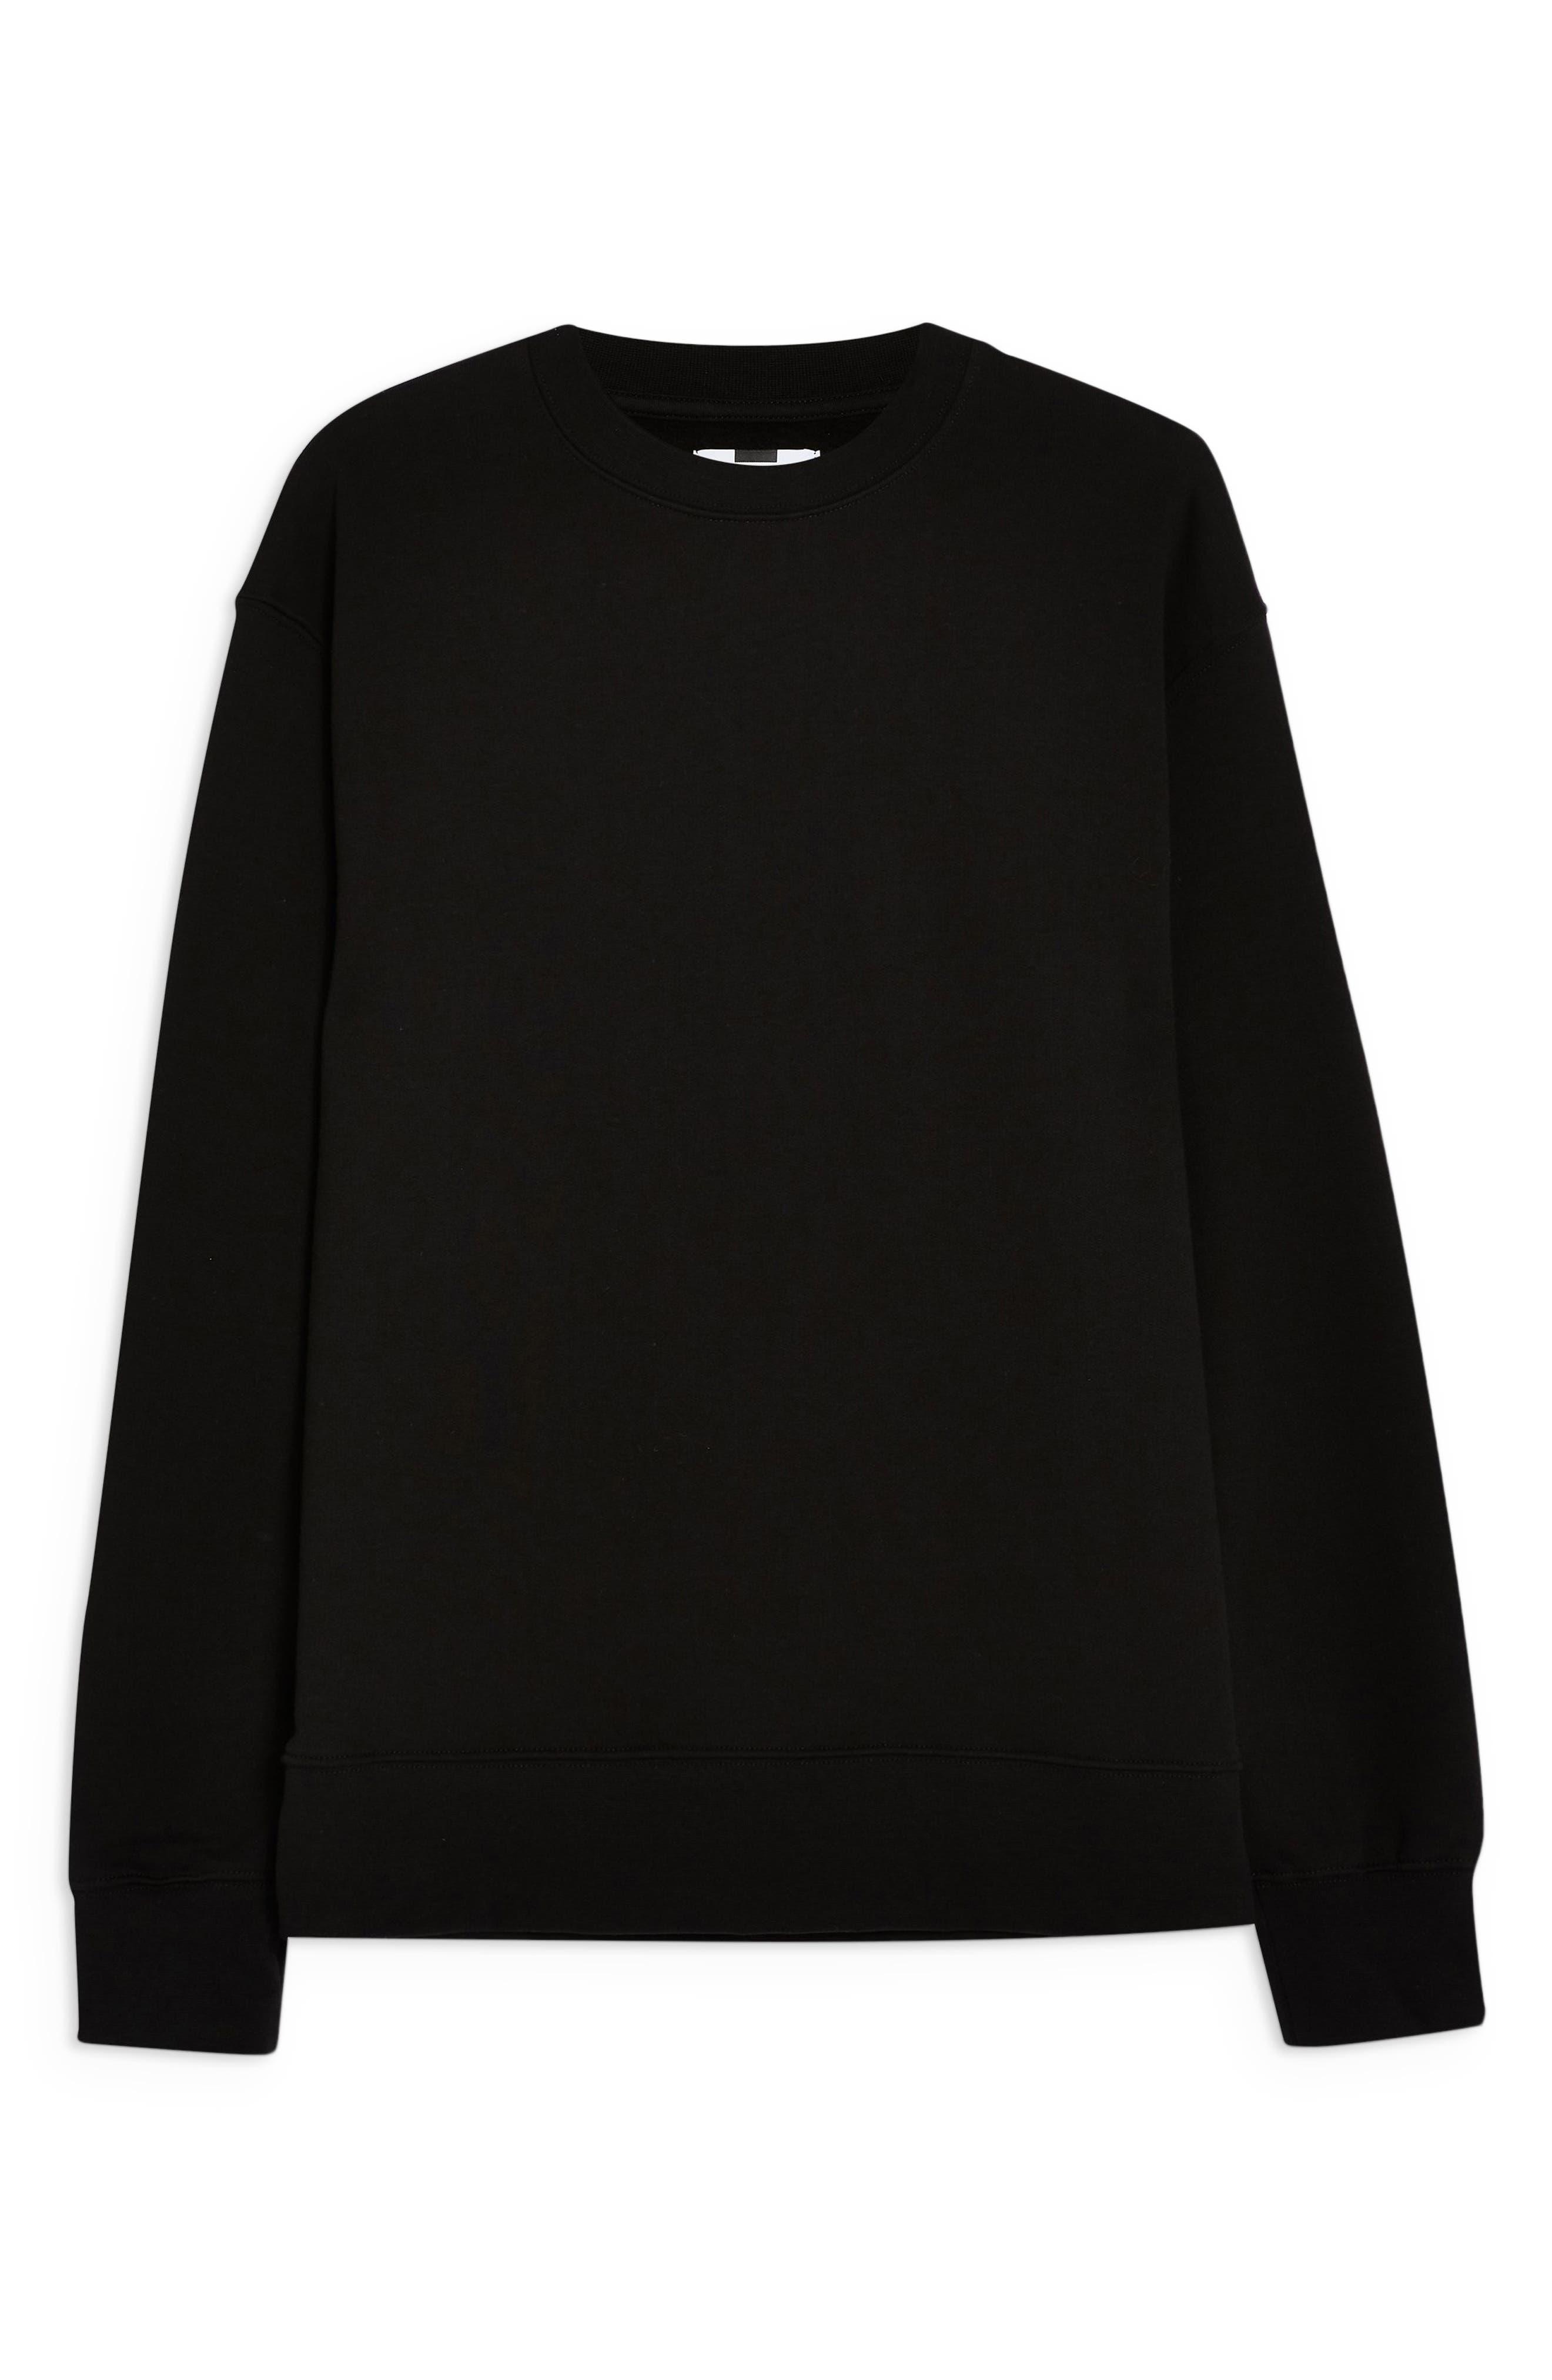 TOPMAN, Crewneck Sweatshirt, Alternate thumbnail 3, color, BLACK